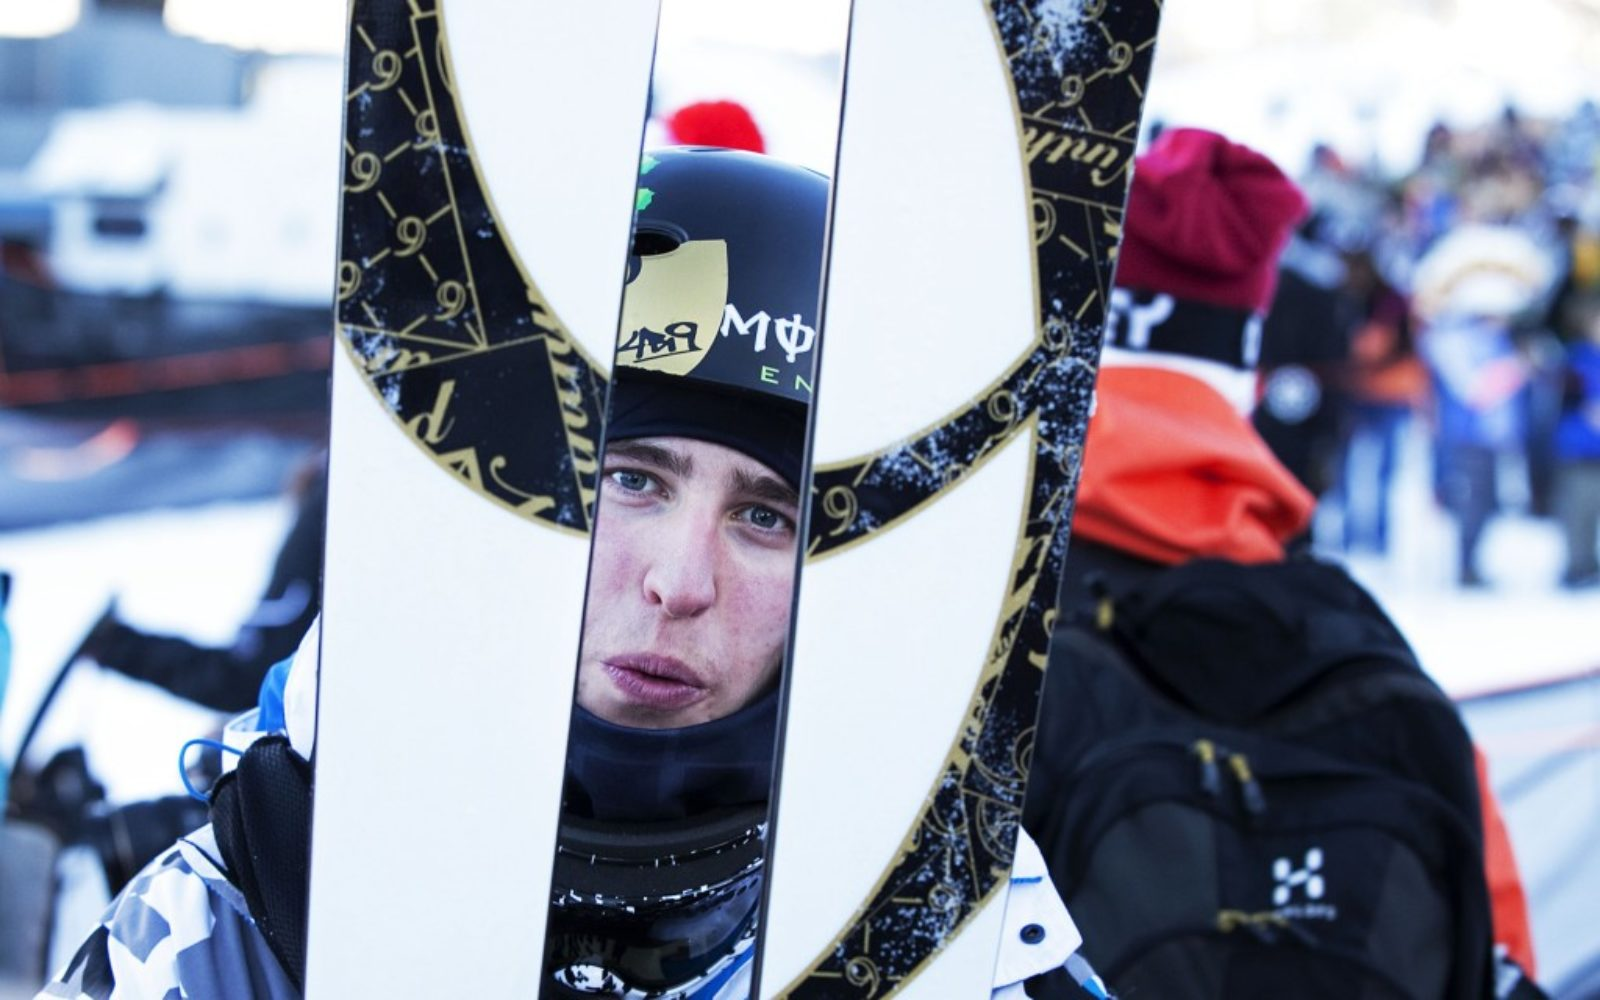 sports-xgames-skier-fun-1024x640